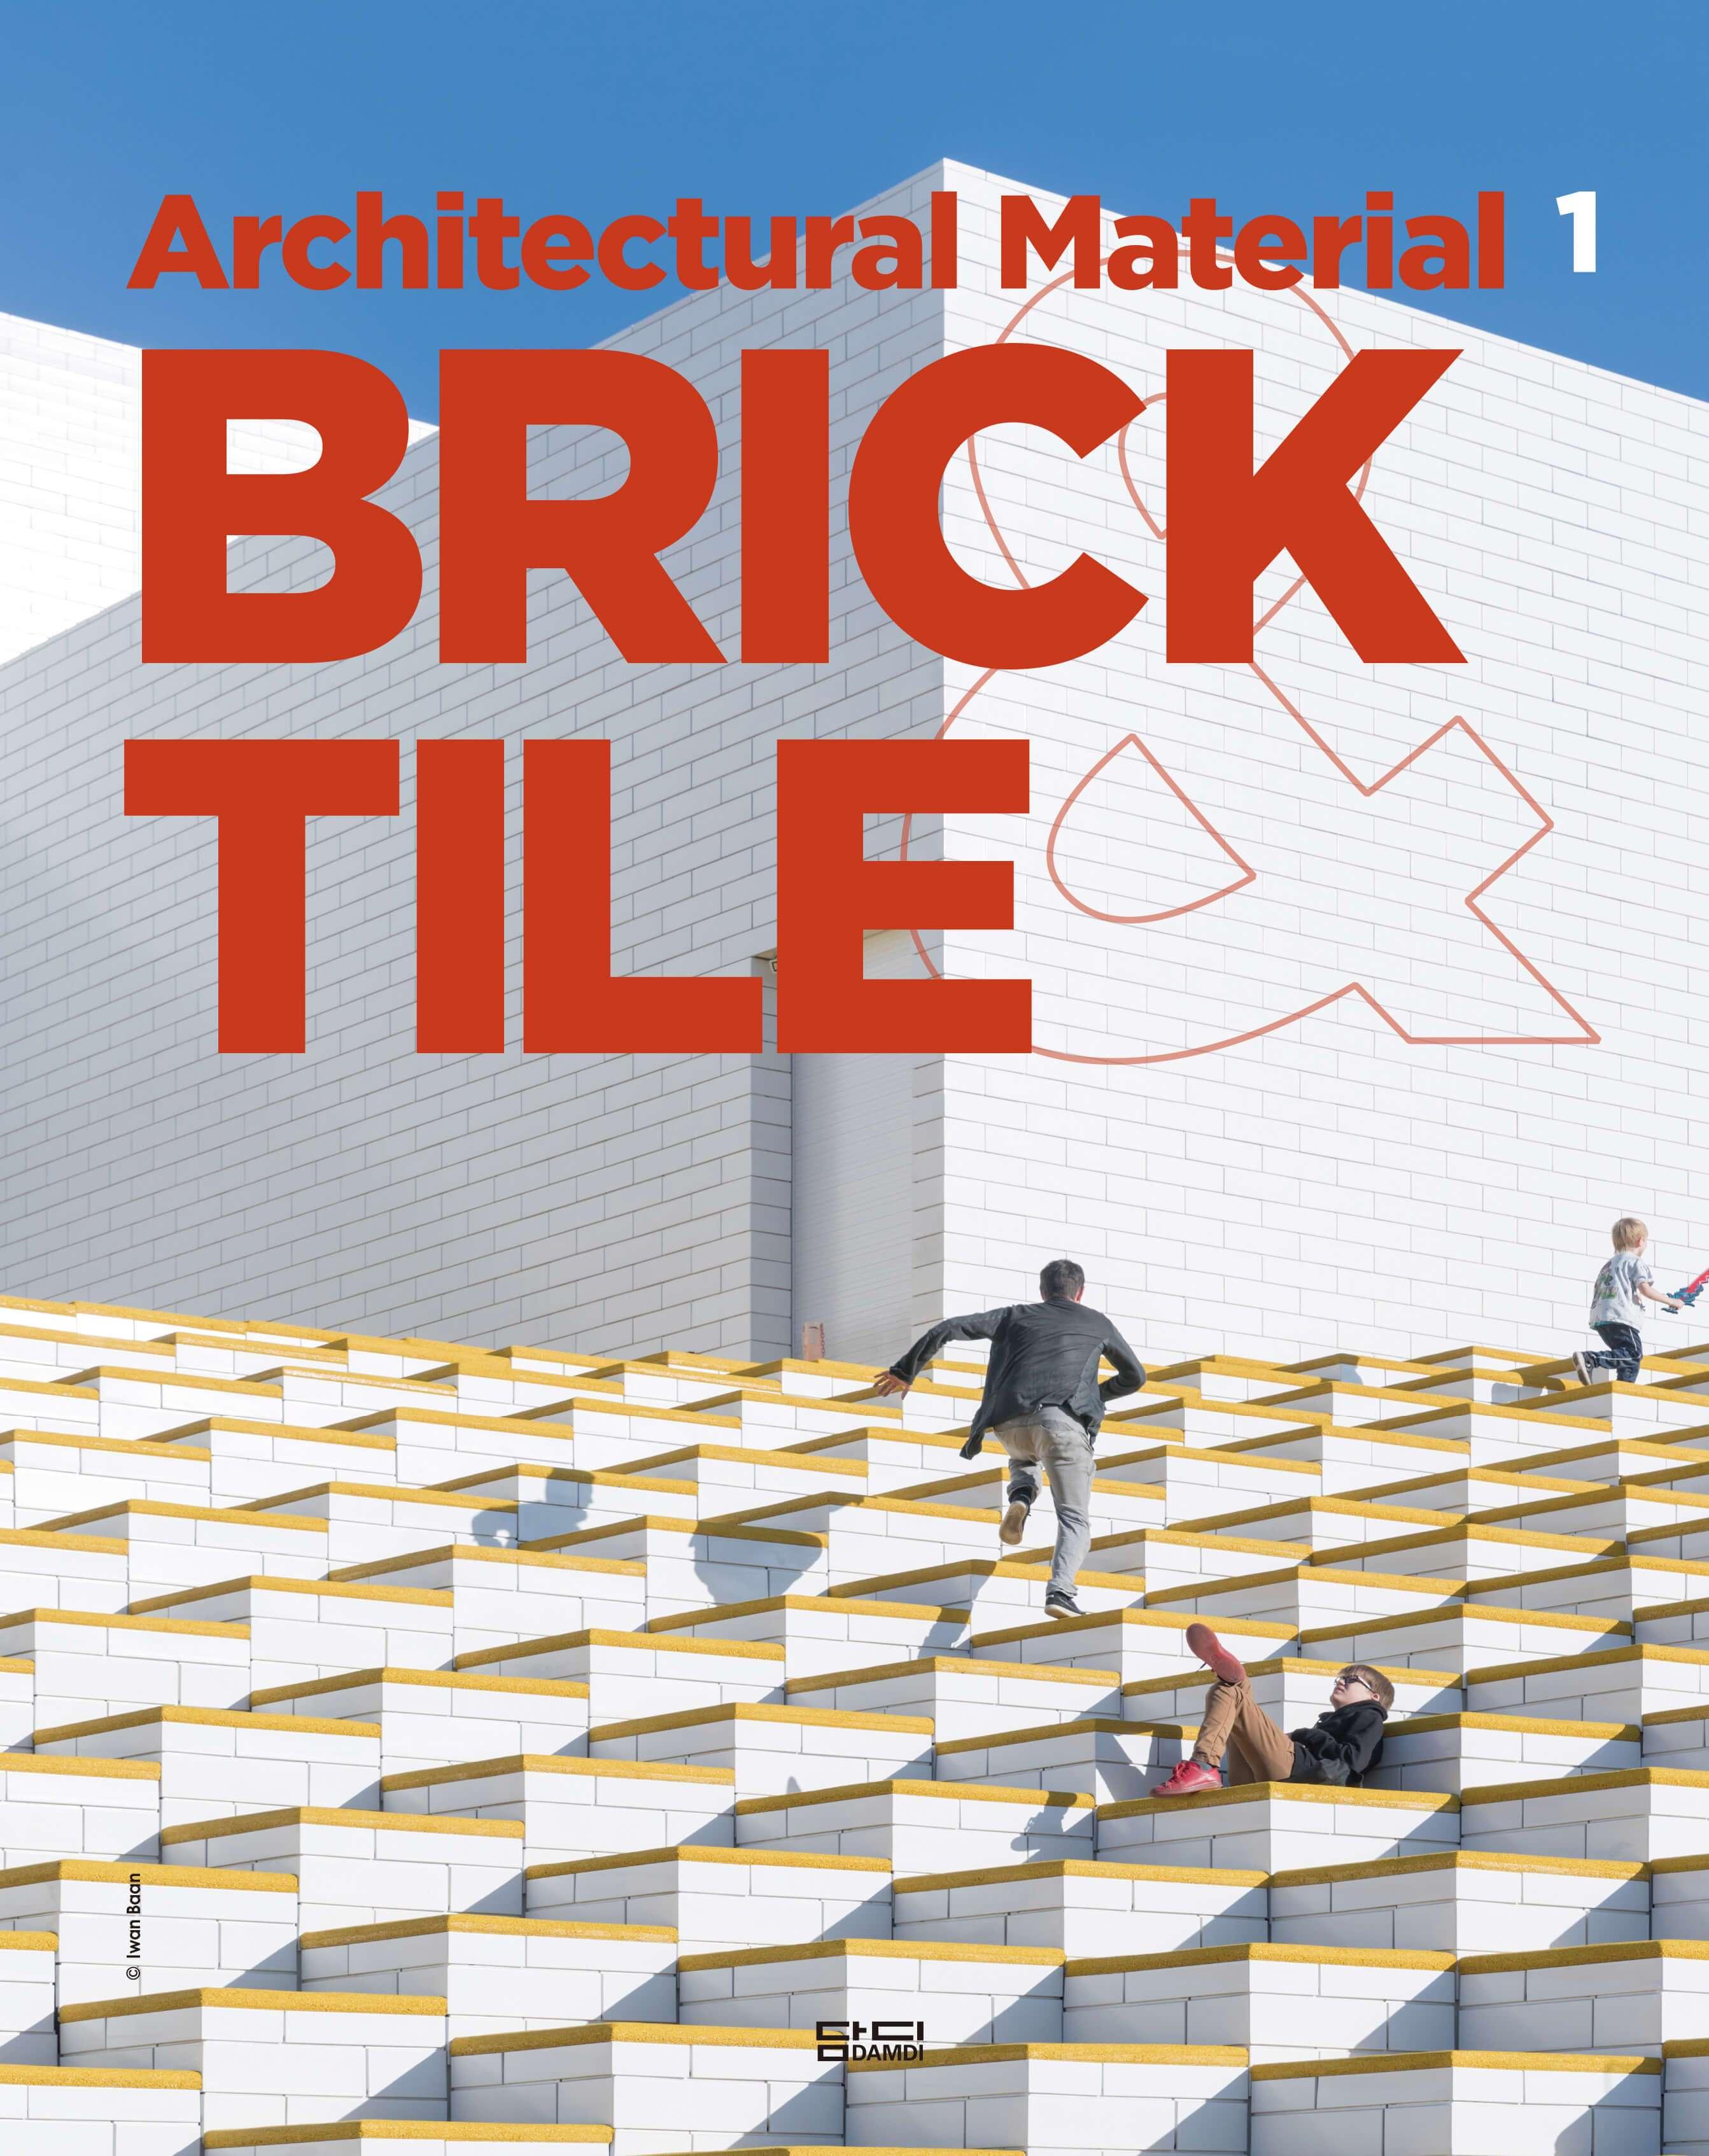 obra publicada - portada Architectural Material 1 - BRICK&TILE -DAMDI Publishing House - iA_house LANDÍNEZ+REY arquitectos